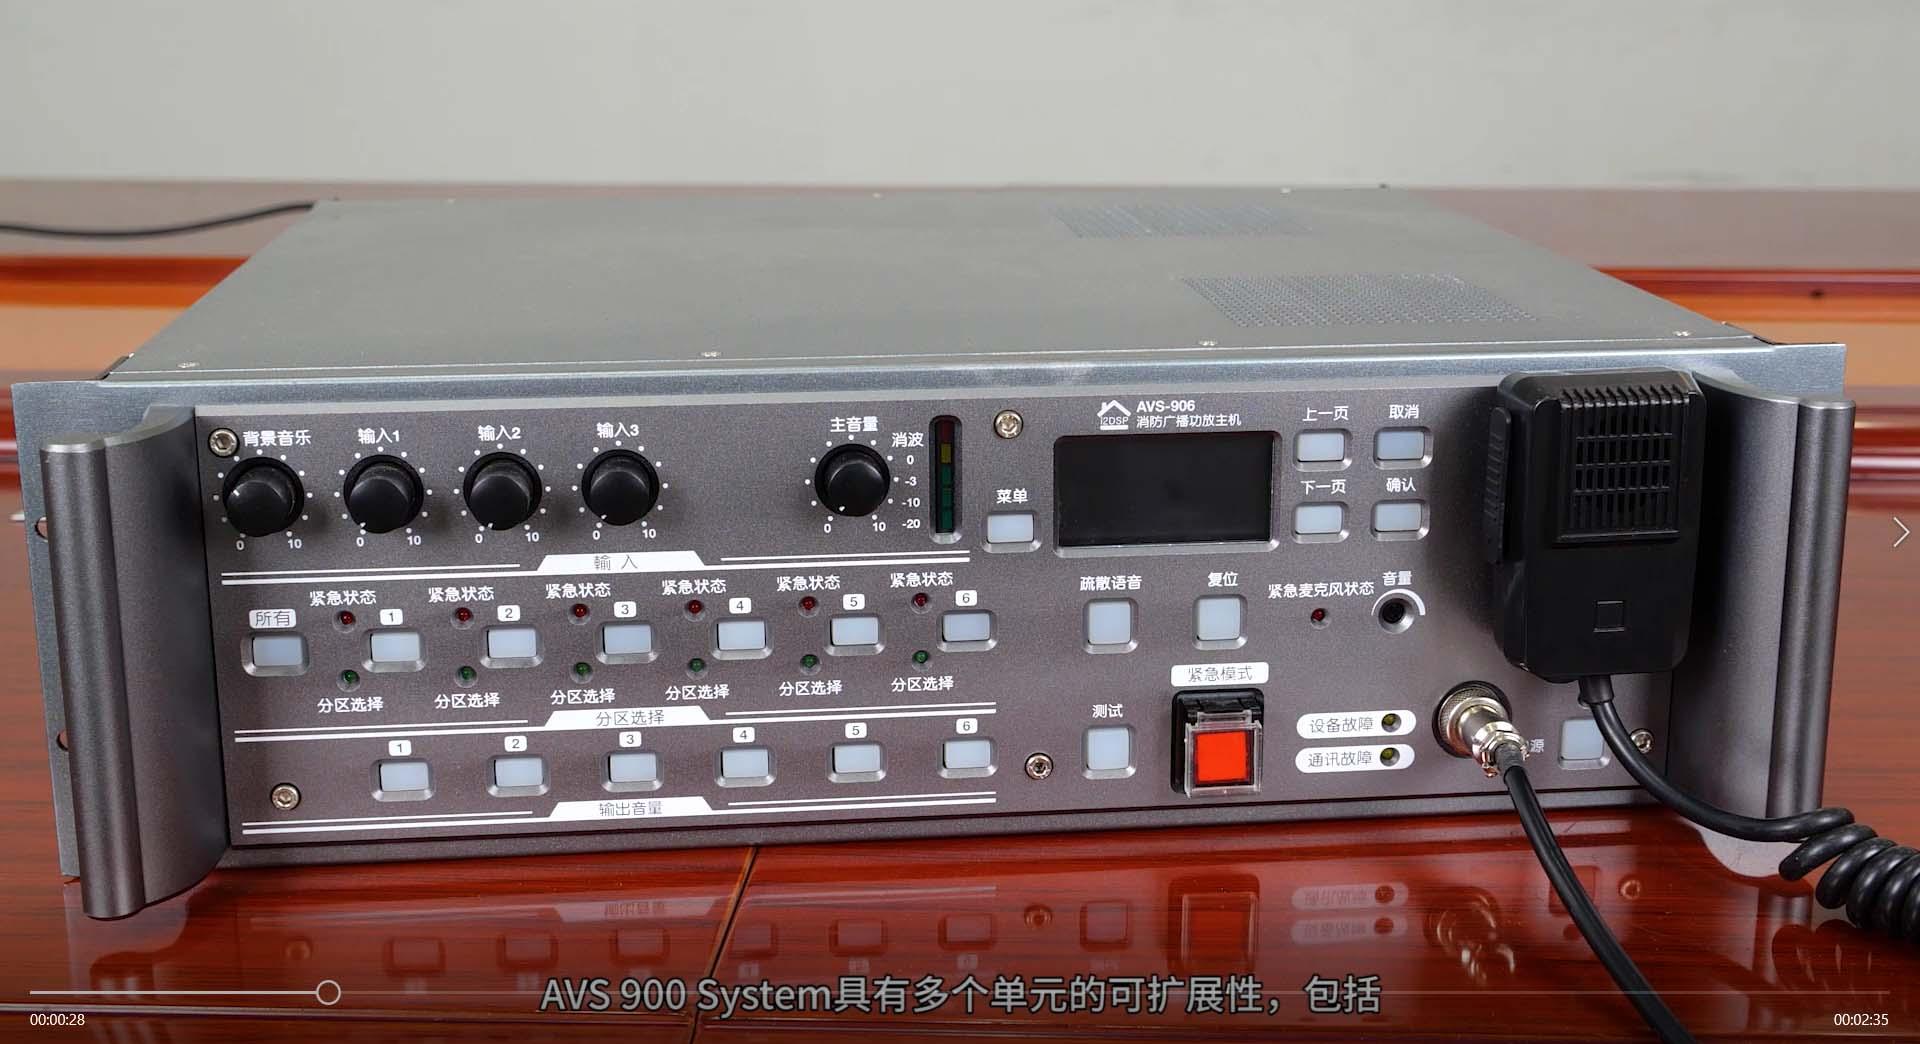 VIDEO – i2DSP AVS900 Series